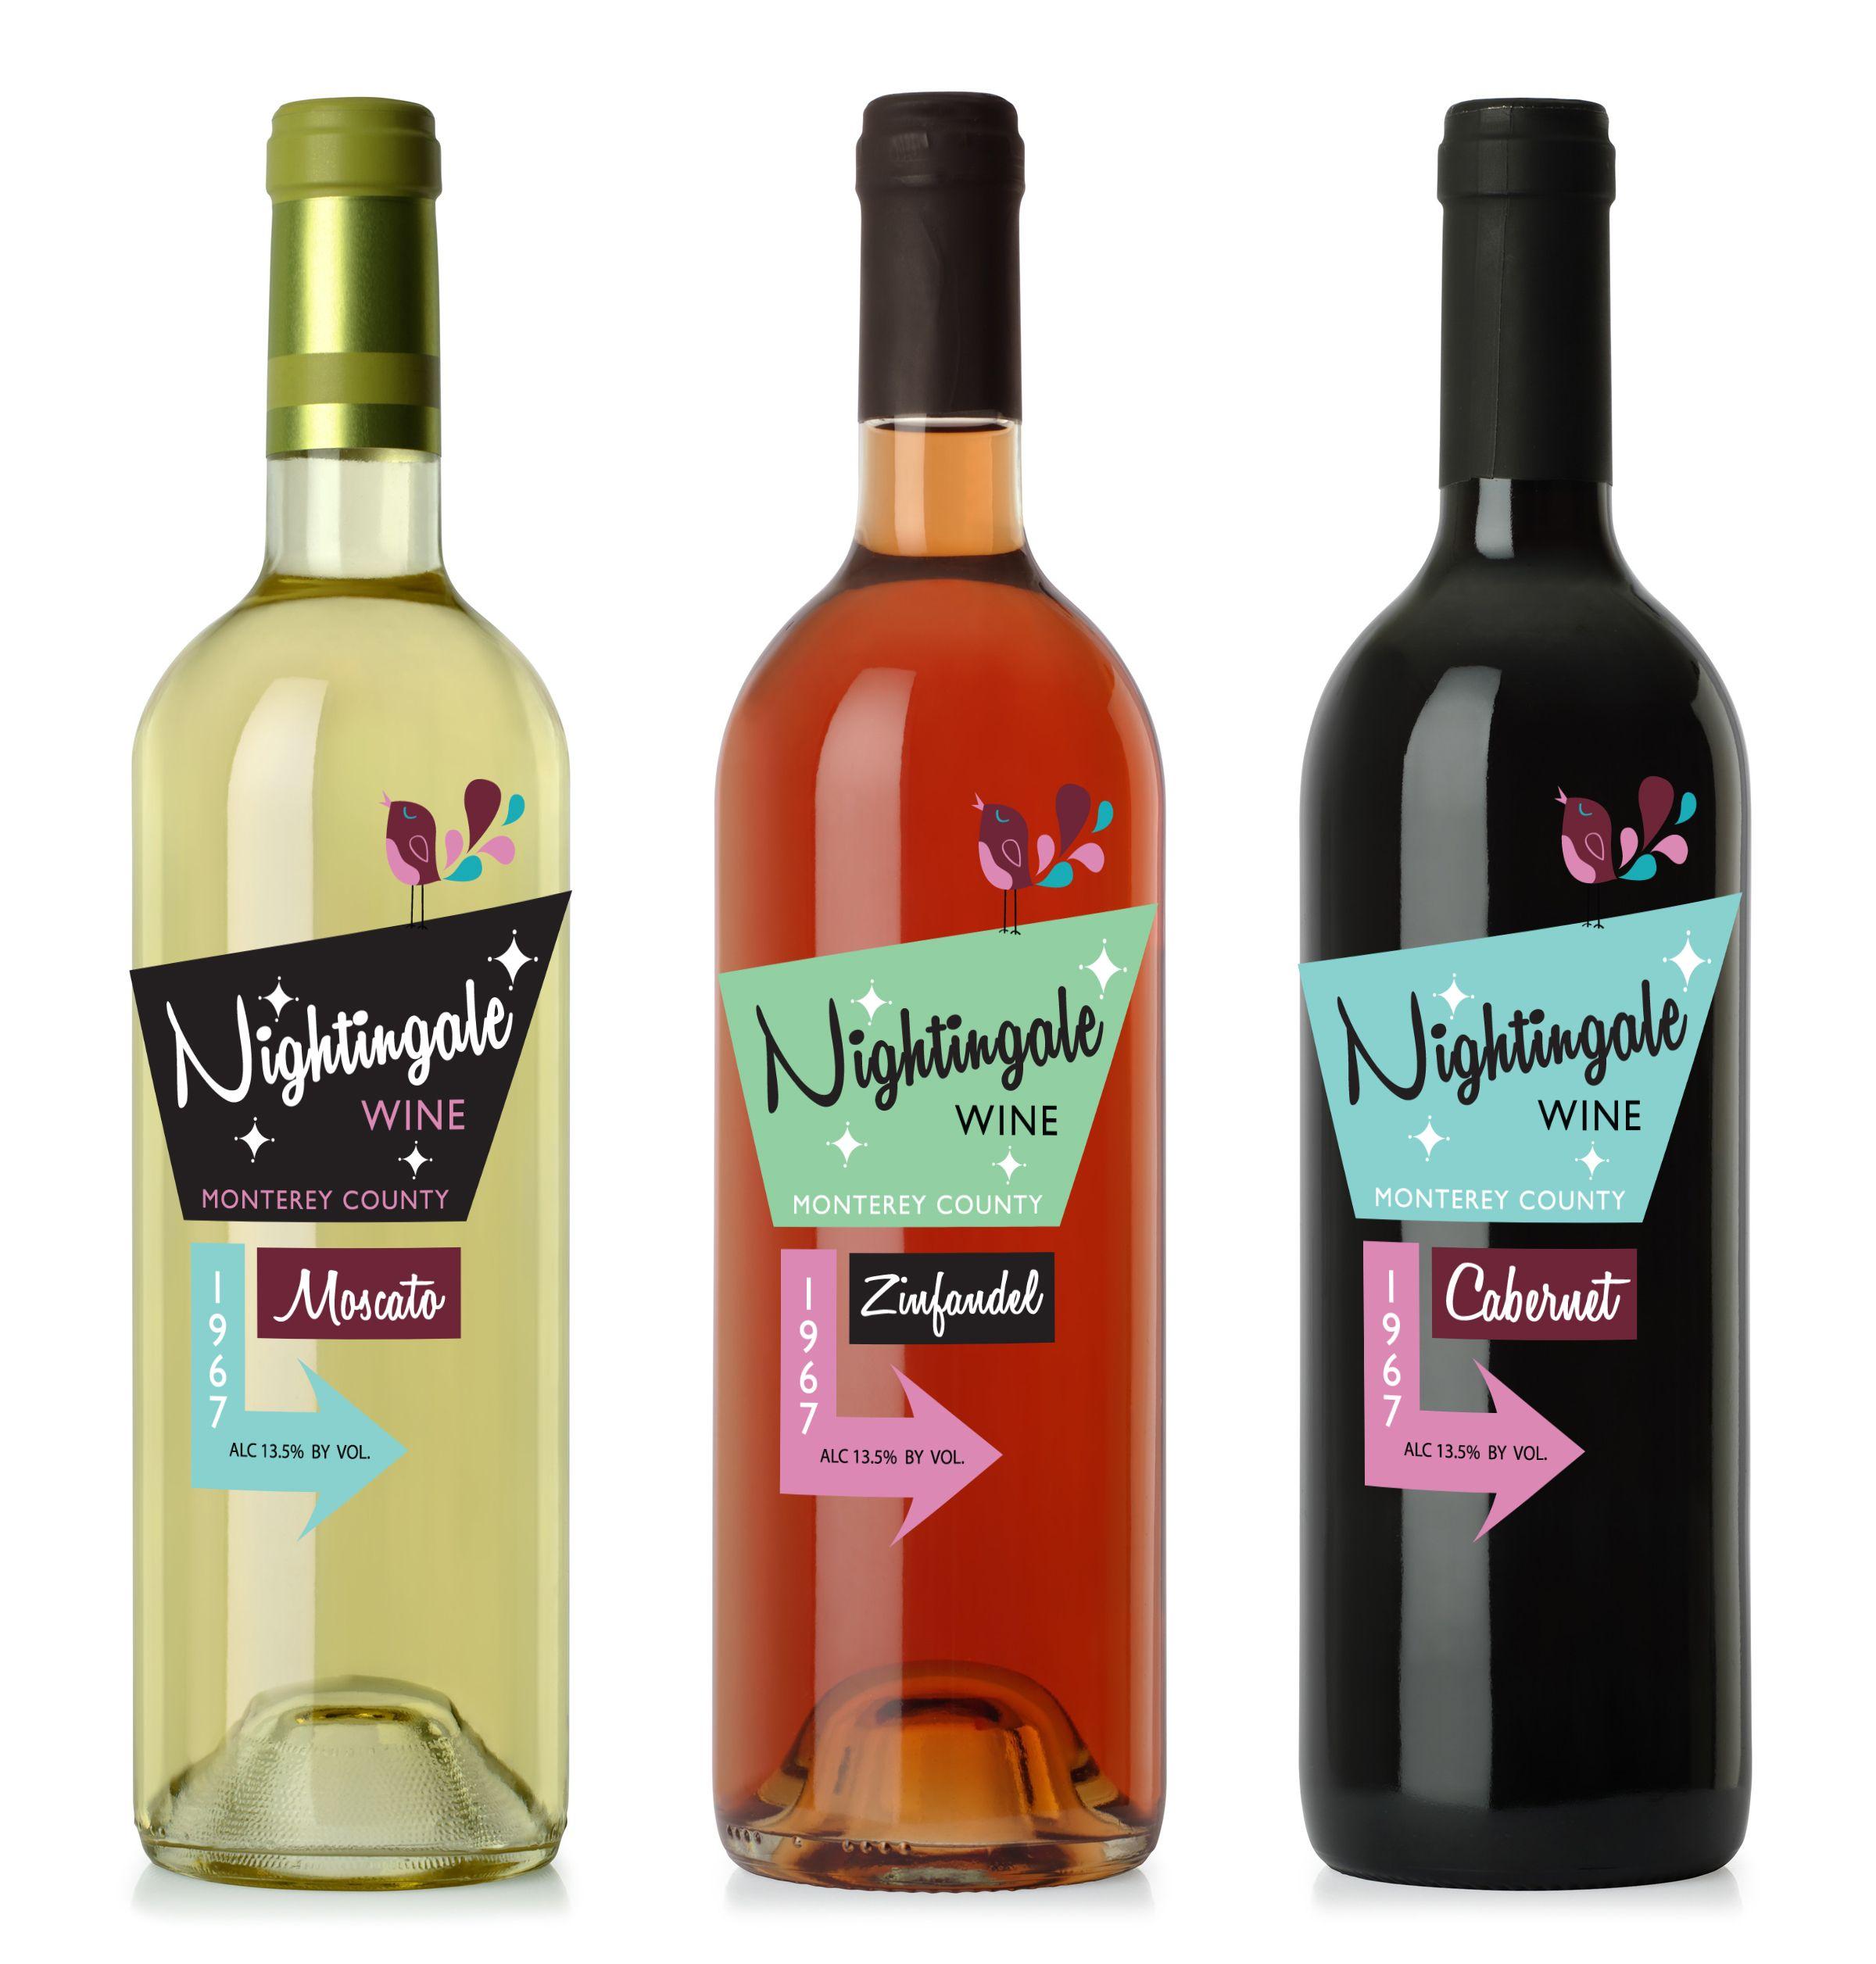 Student Project By Angela Truzinski Wine Label Designs For Nightingale Wine Wine Taninotanino Vinosmax Wine Label Design Wine Label Wine Label Collection